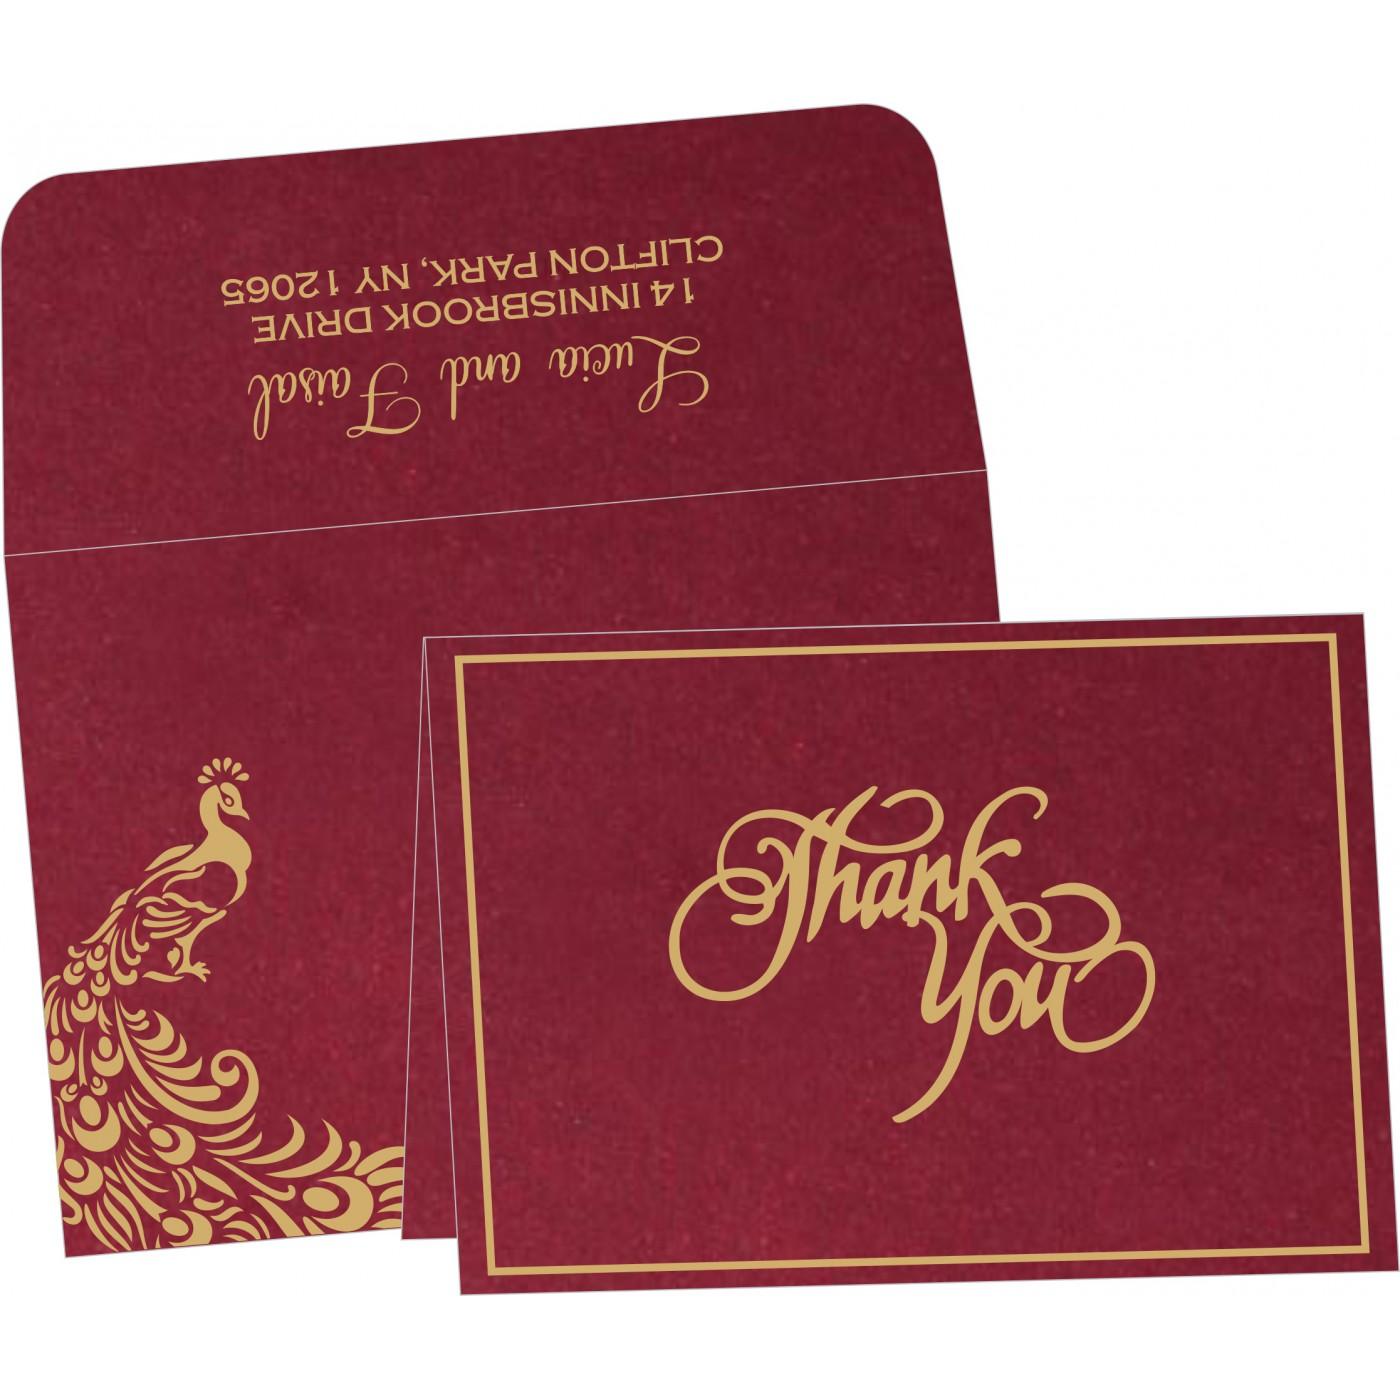 Thank You Cards : TYC-8255A - 123WeddingCards